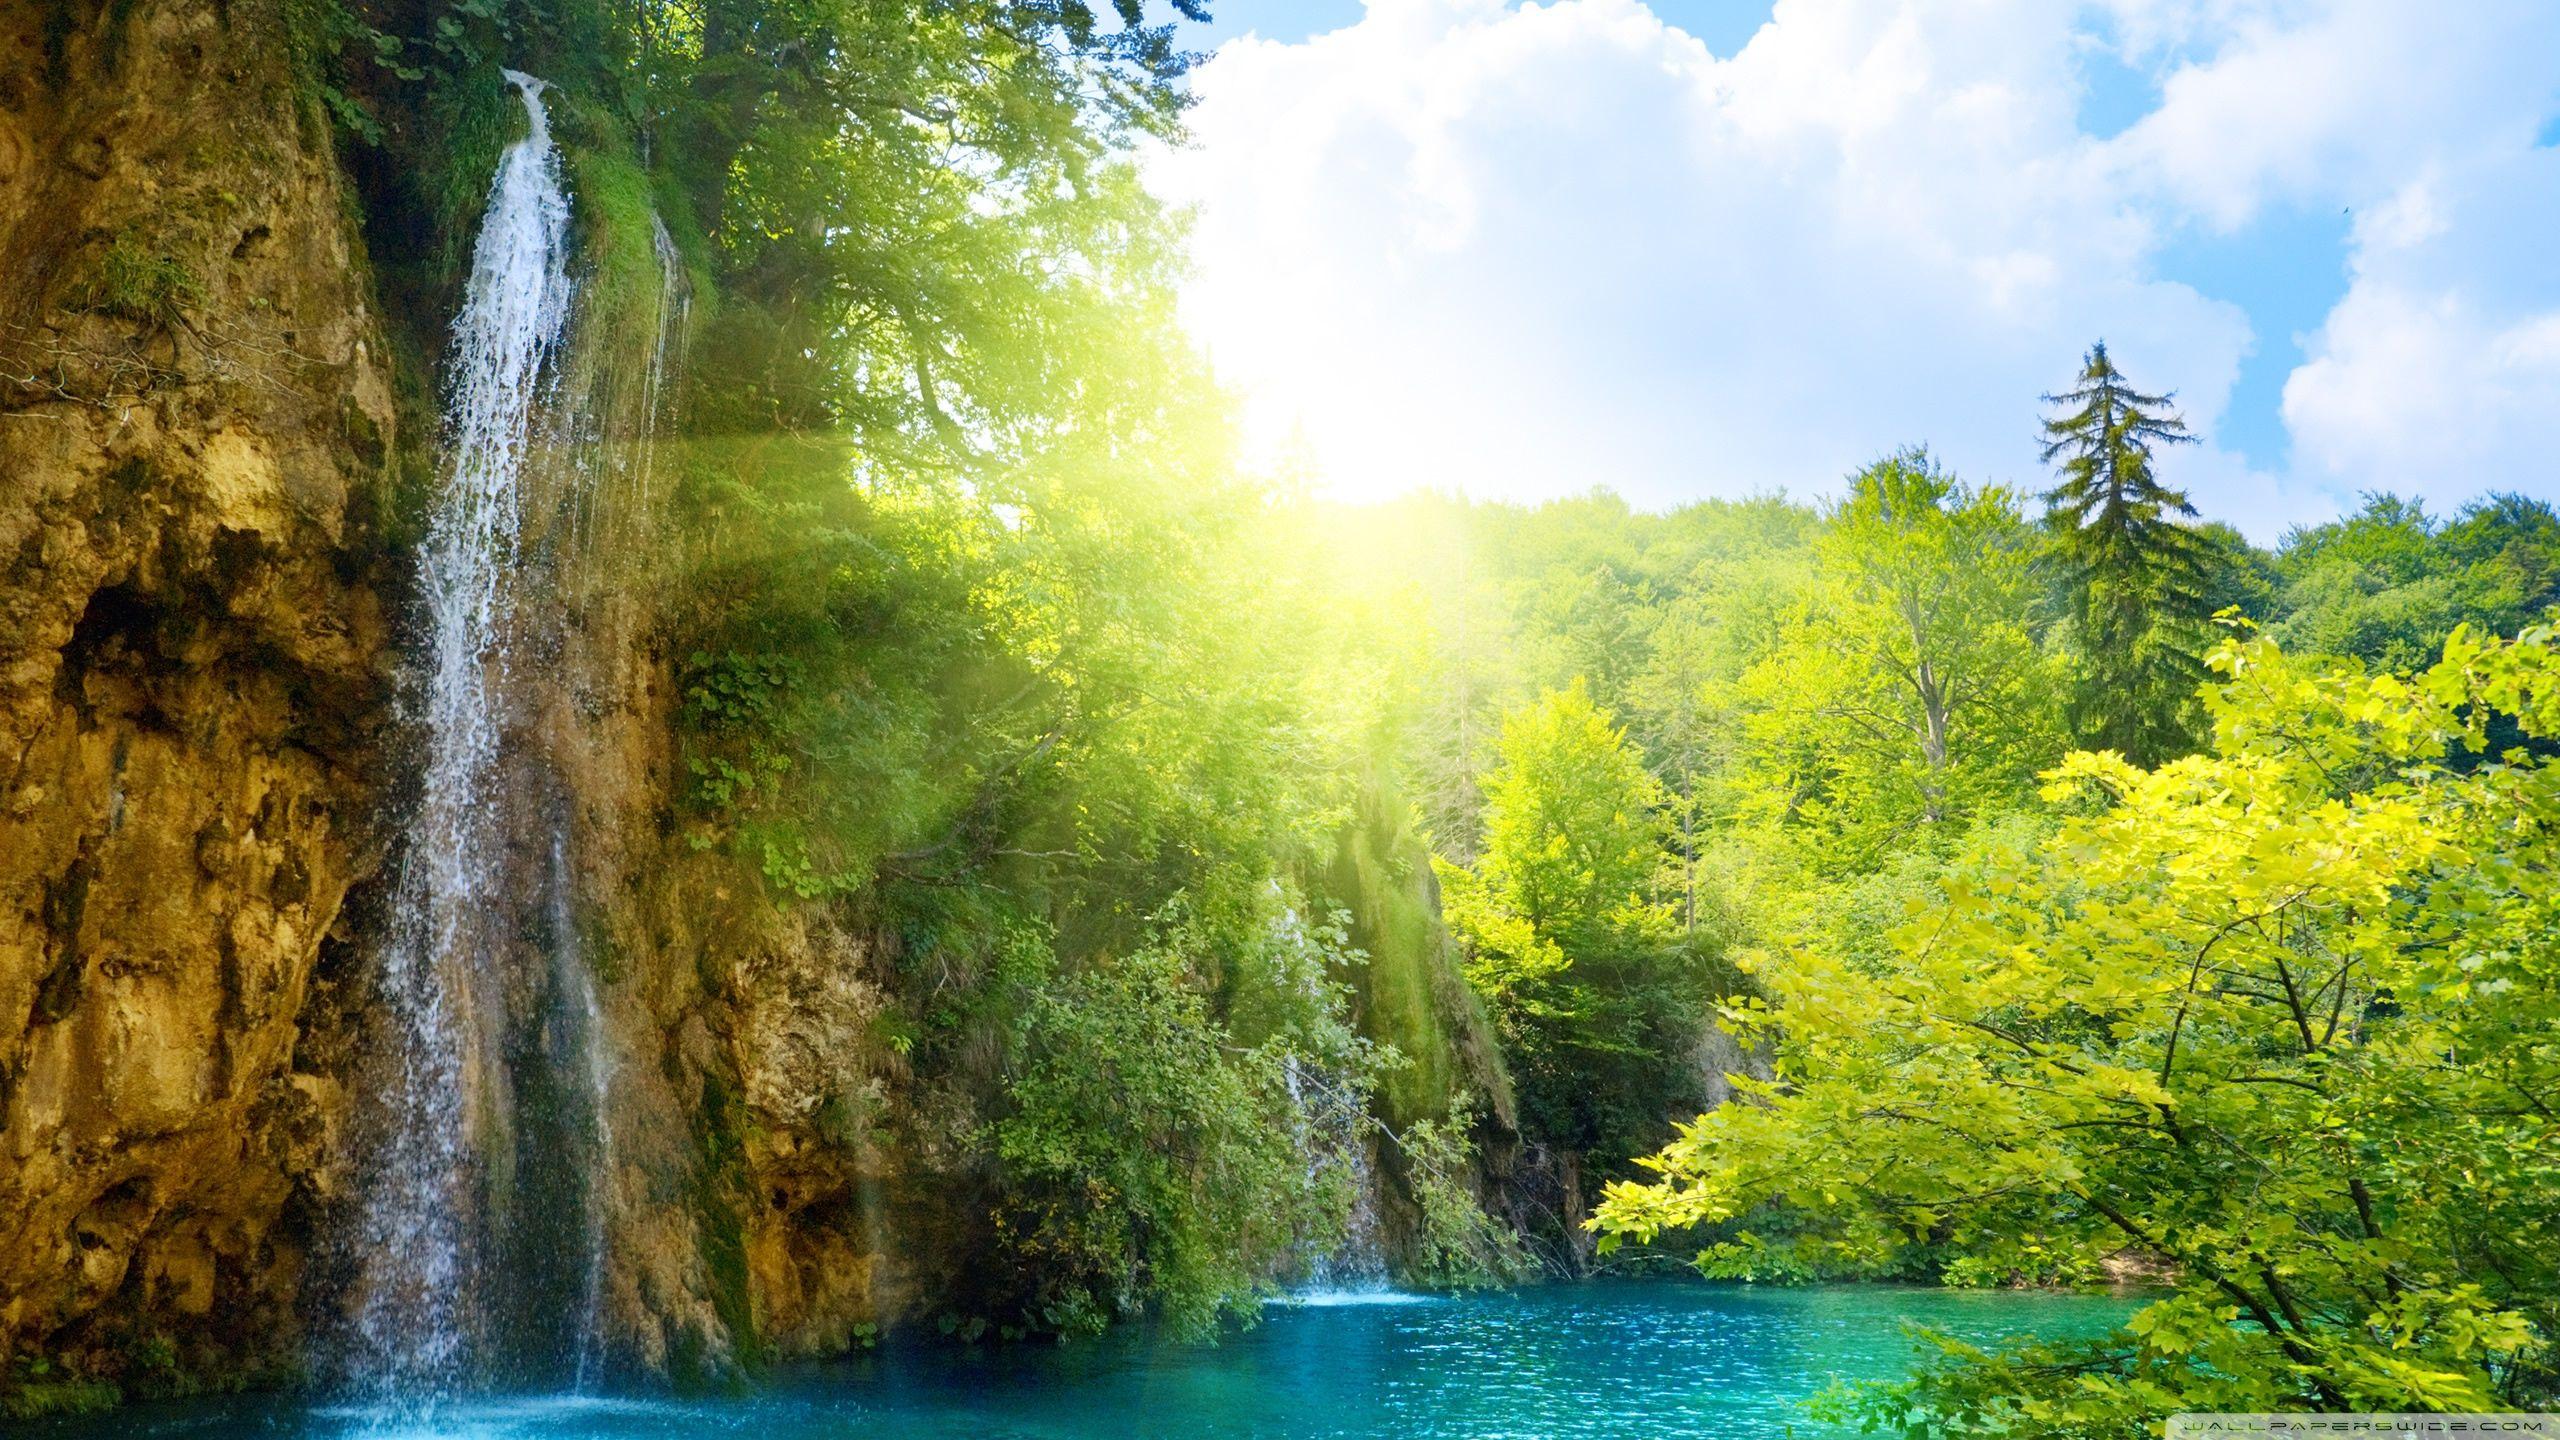 Forest Falls Wallpaper 2560x1440 Waterfall Wallpaper Waterfall Nature